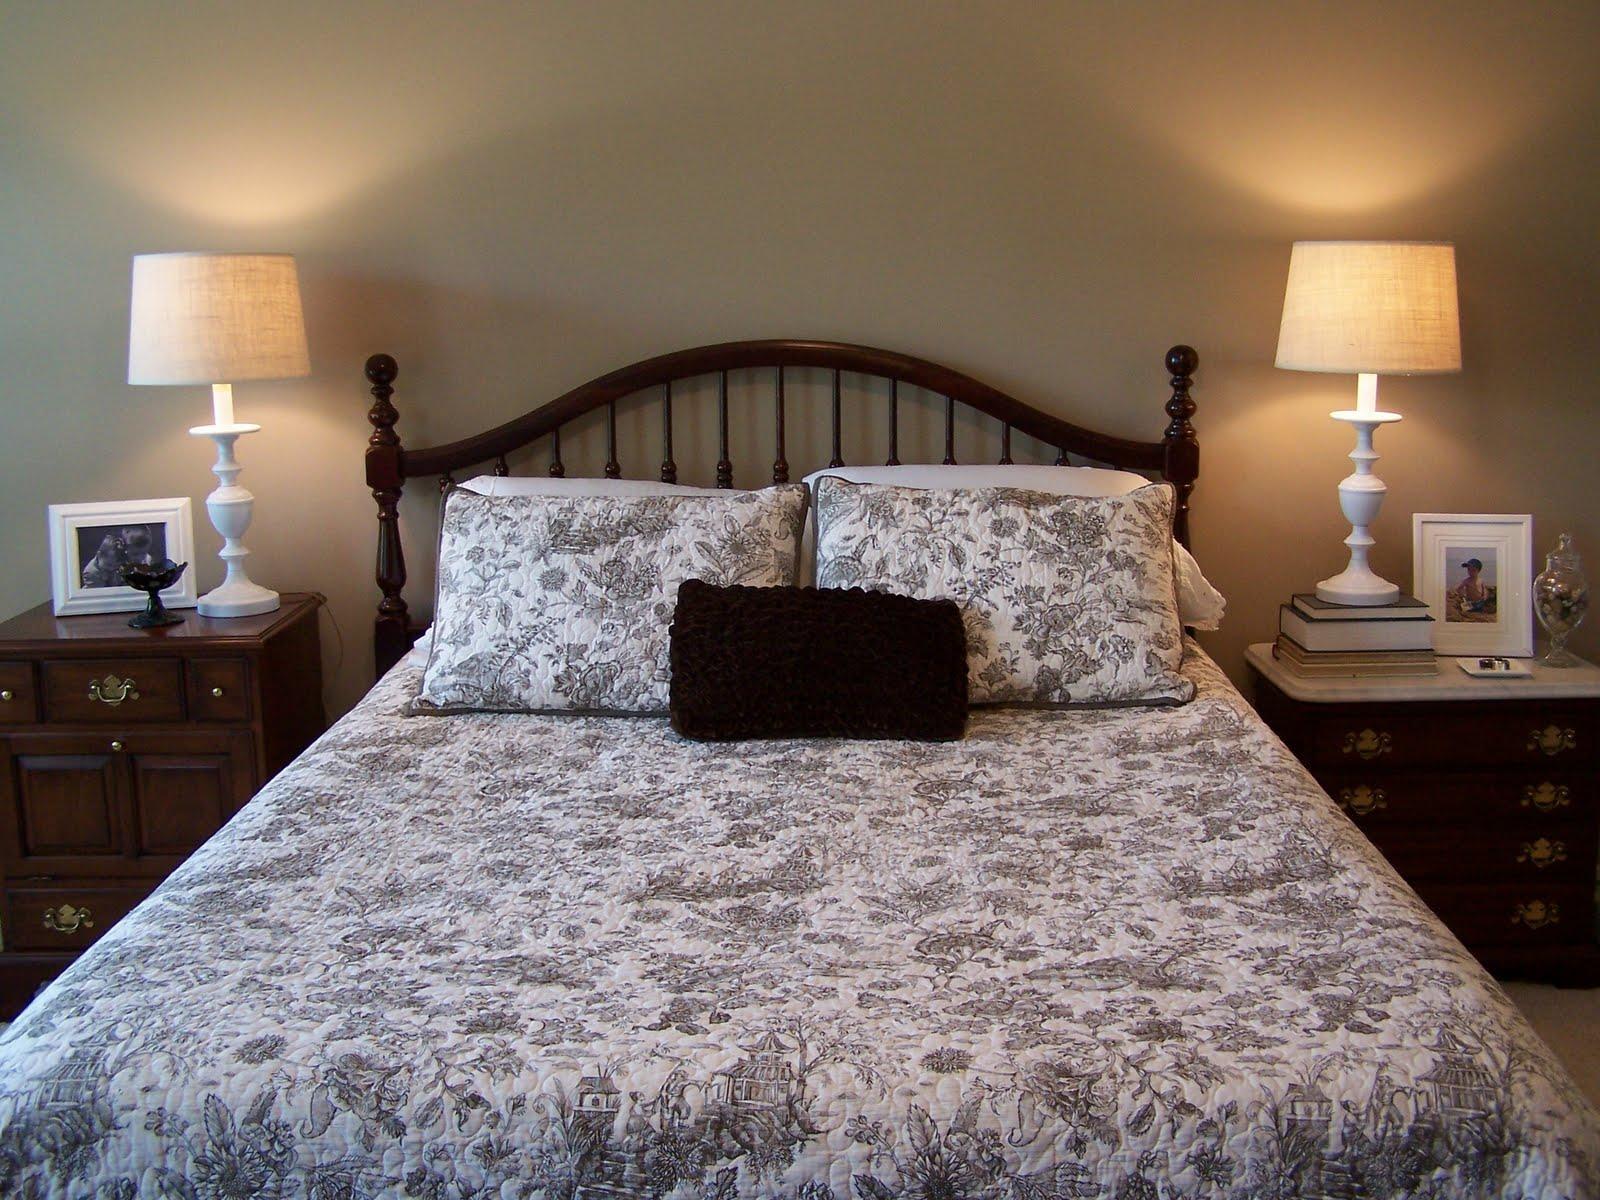 Homemakin And Decoratin: Master Bedroom Dreaming